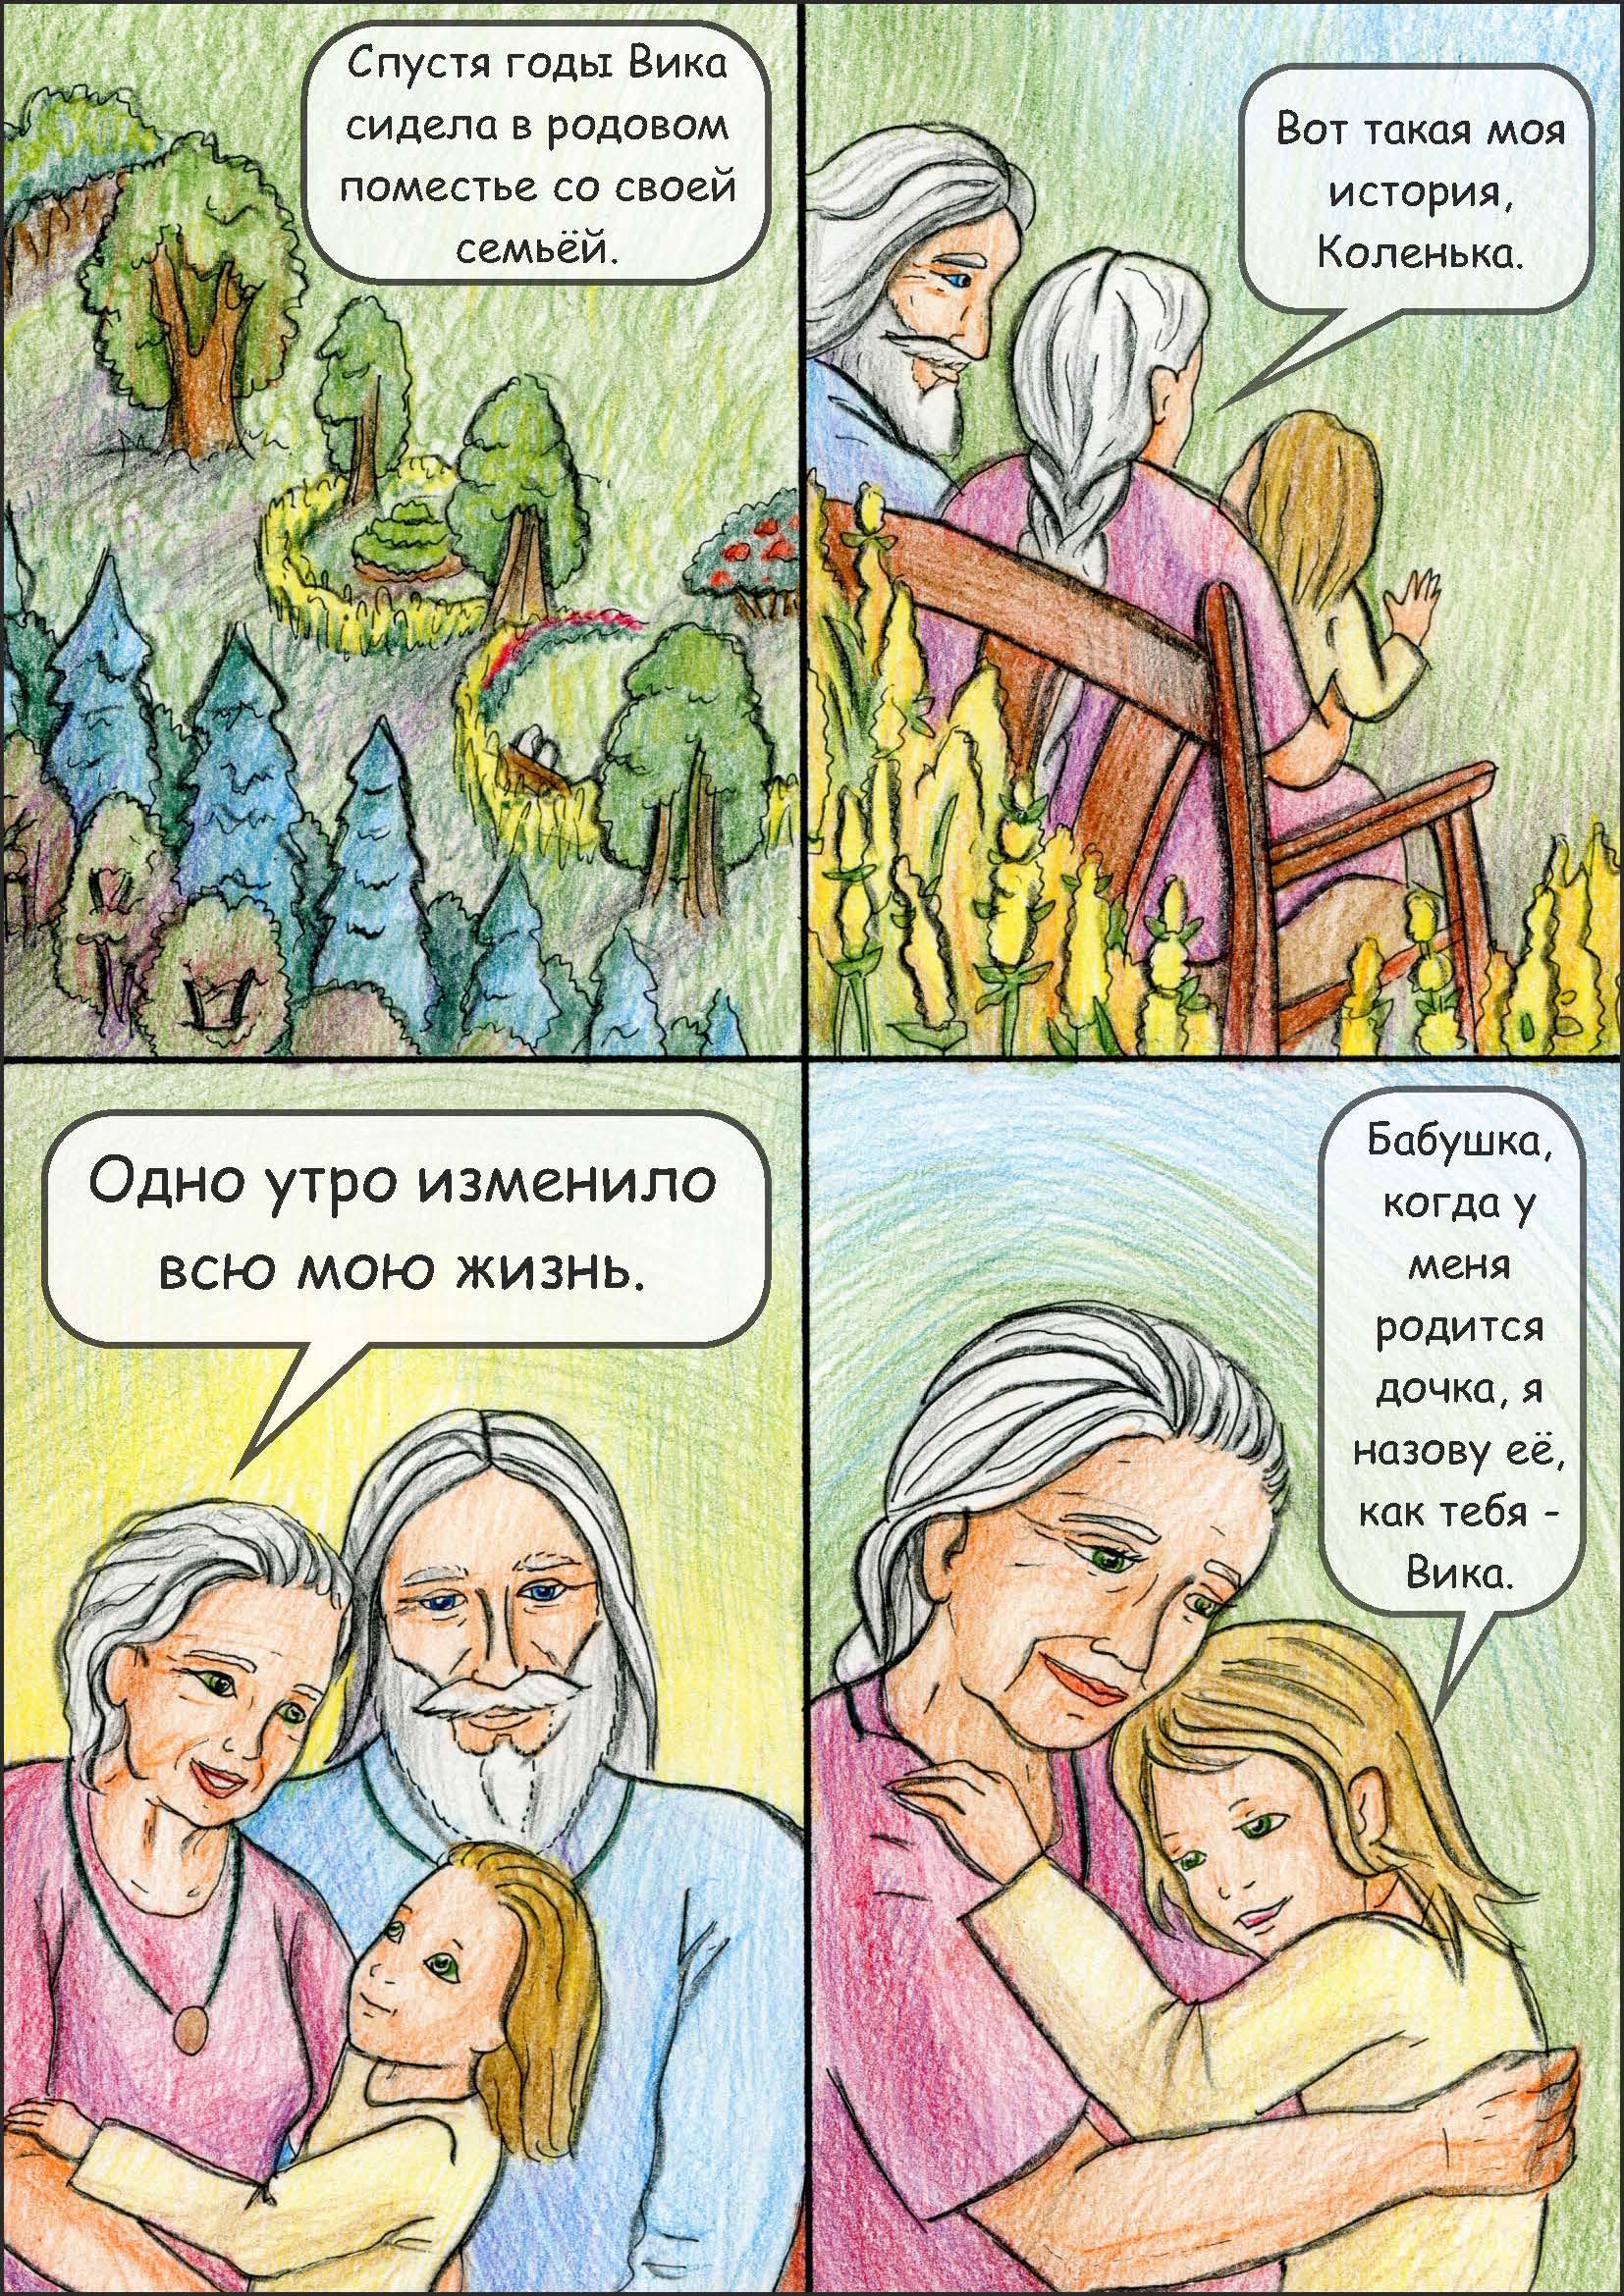 Анна Гейдебрехт. Комикс Зовущая мечта (26).jpg